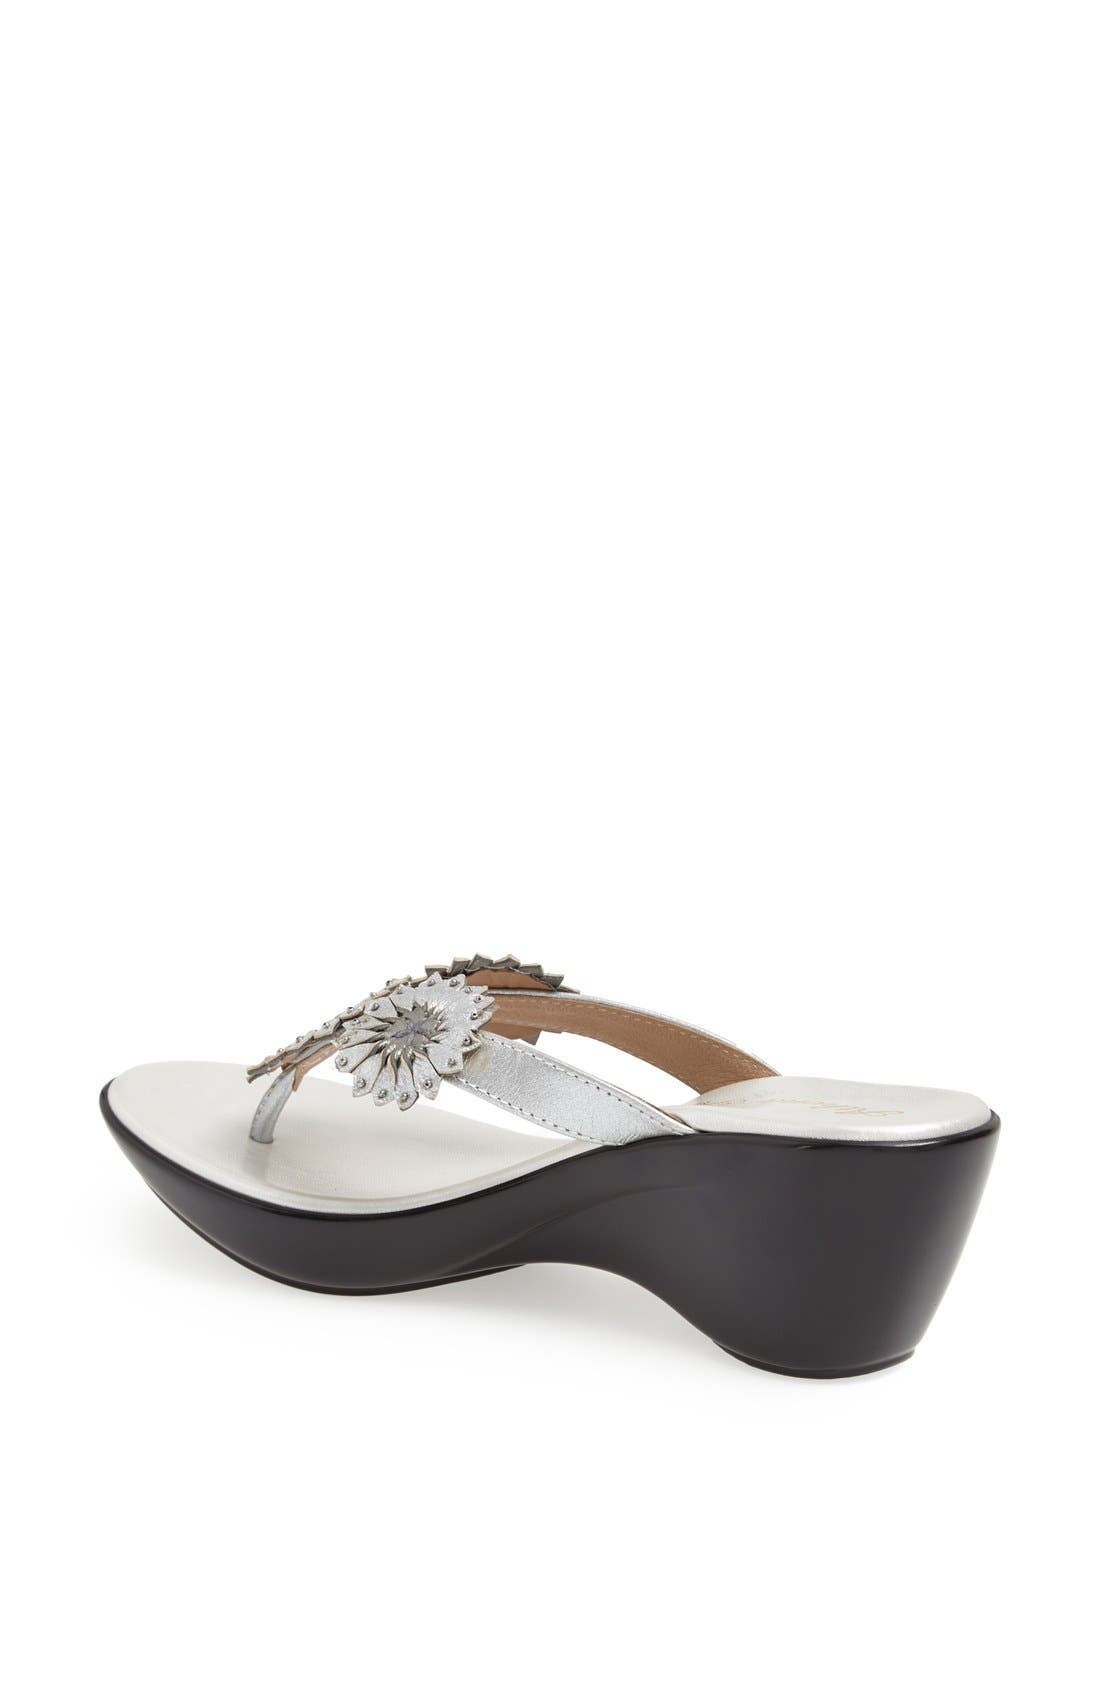 Alternate Image 3  - Athena Alexander 'Clover' Thong Sandal